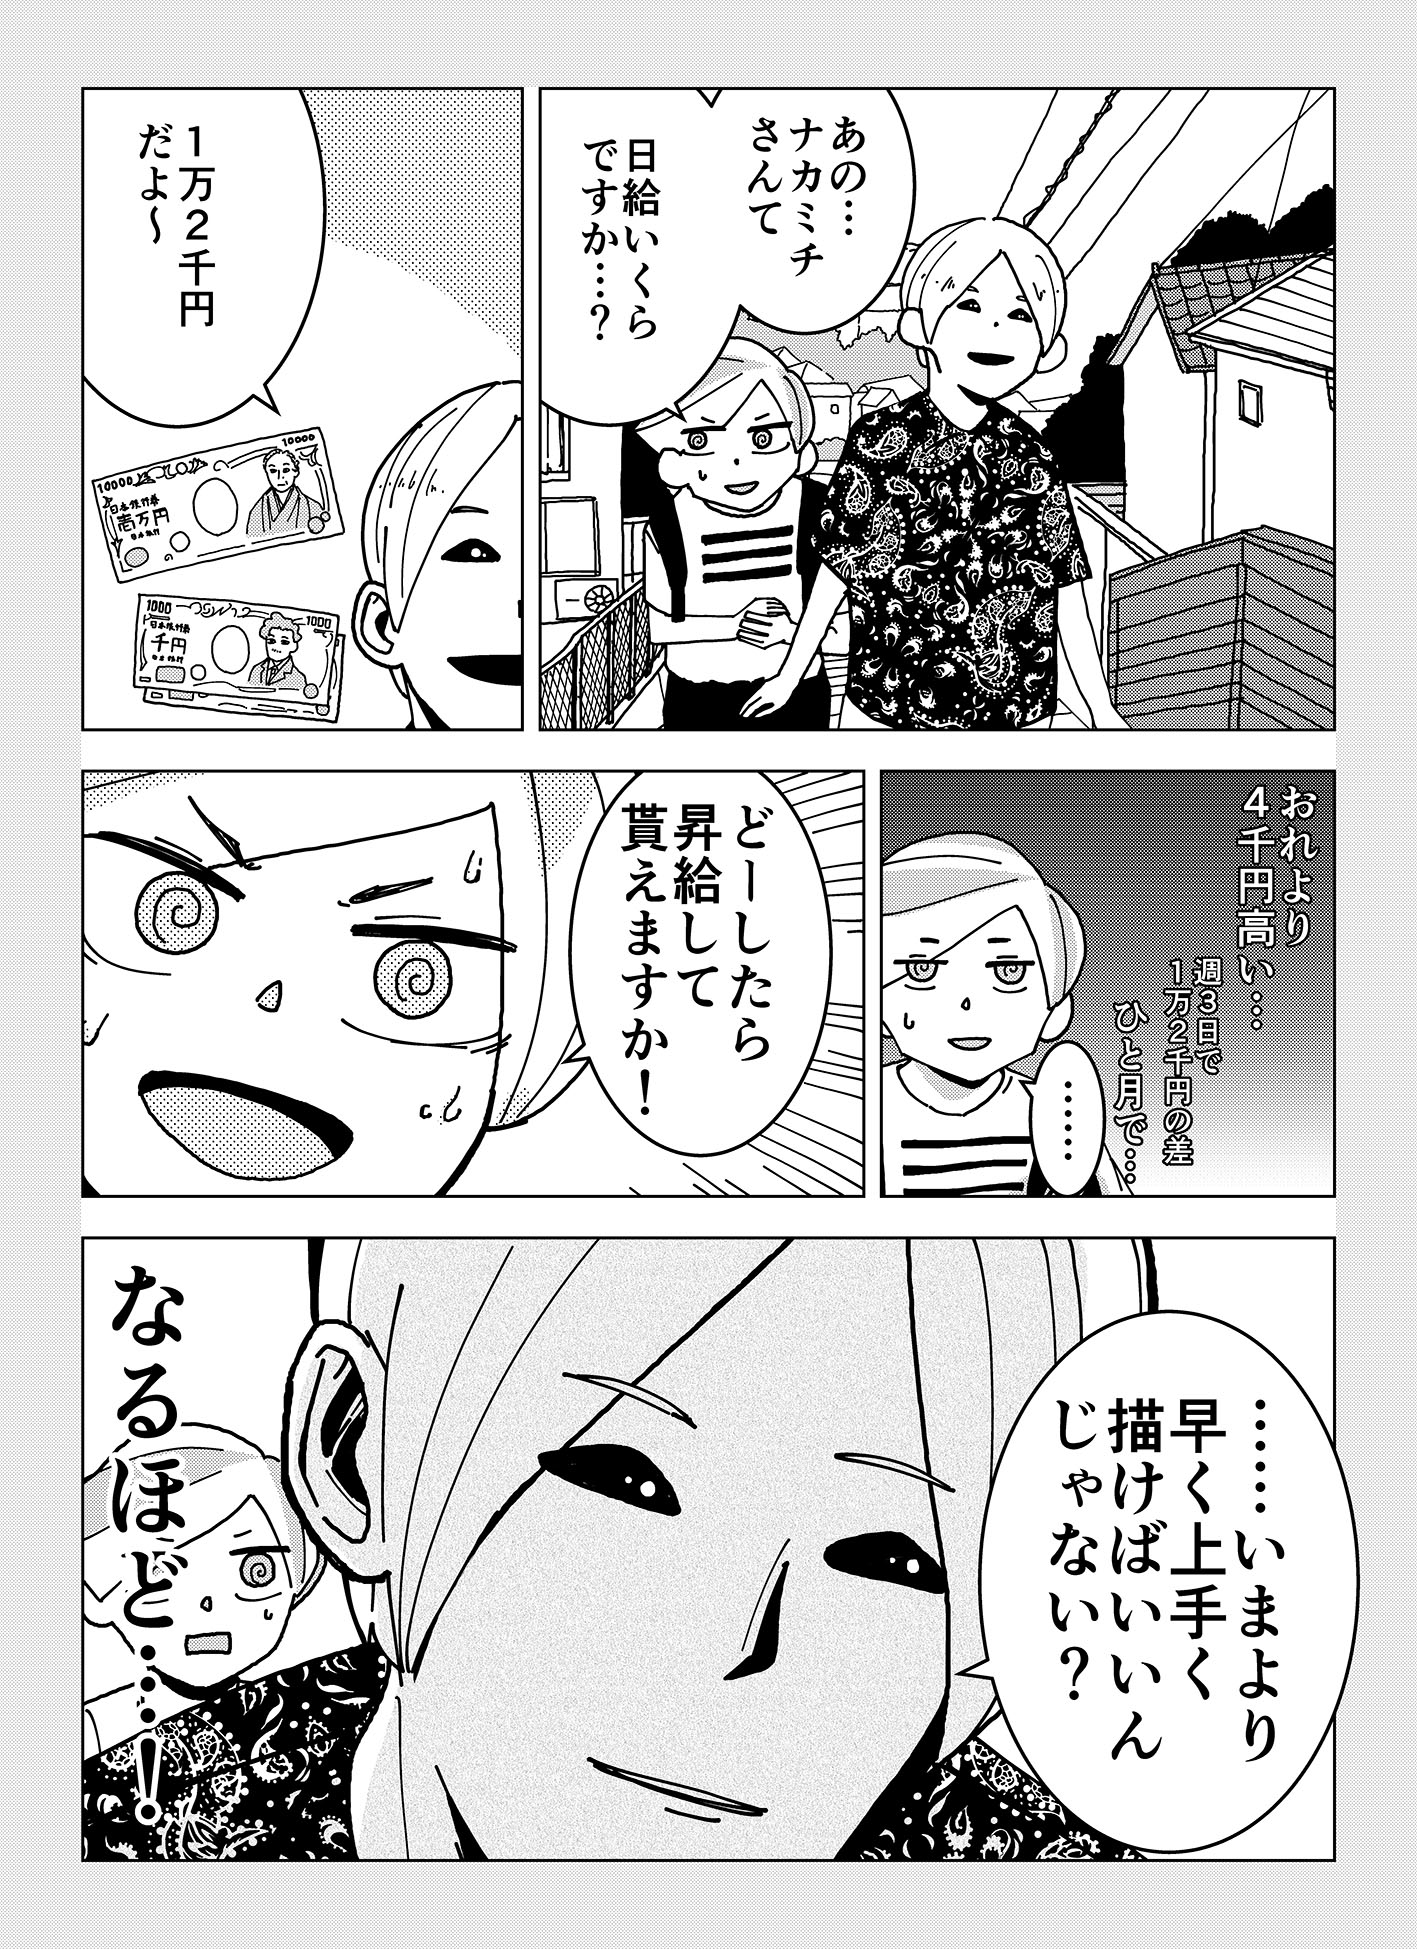 share_07_04_new